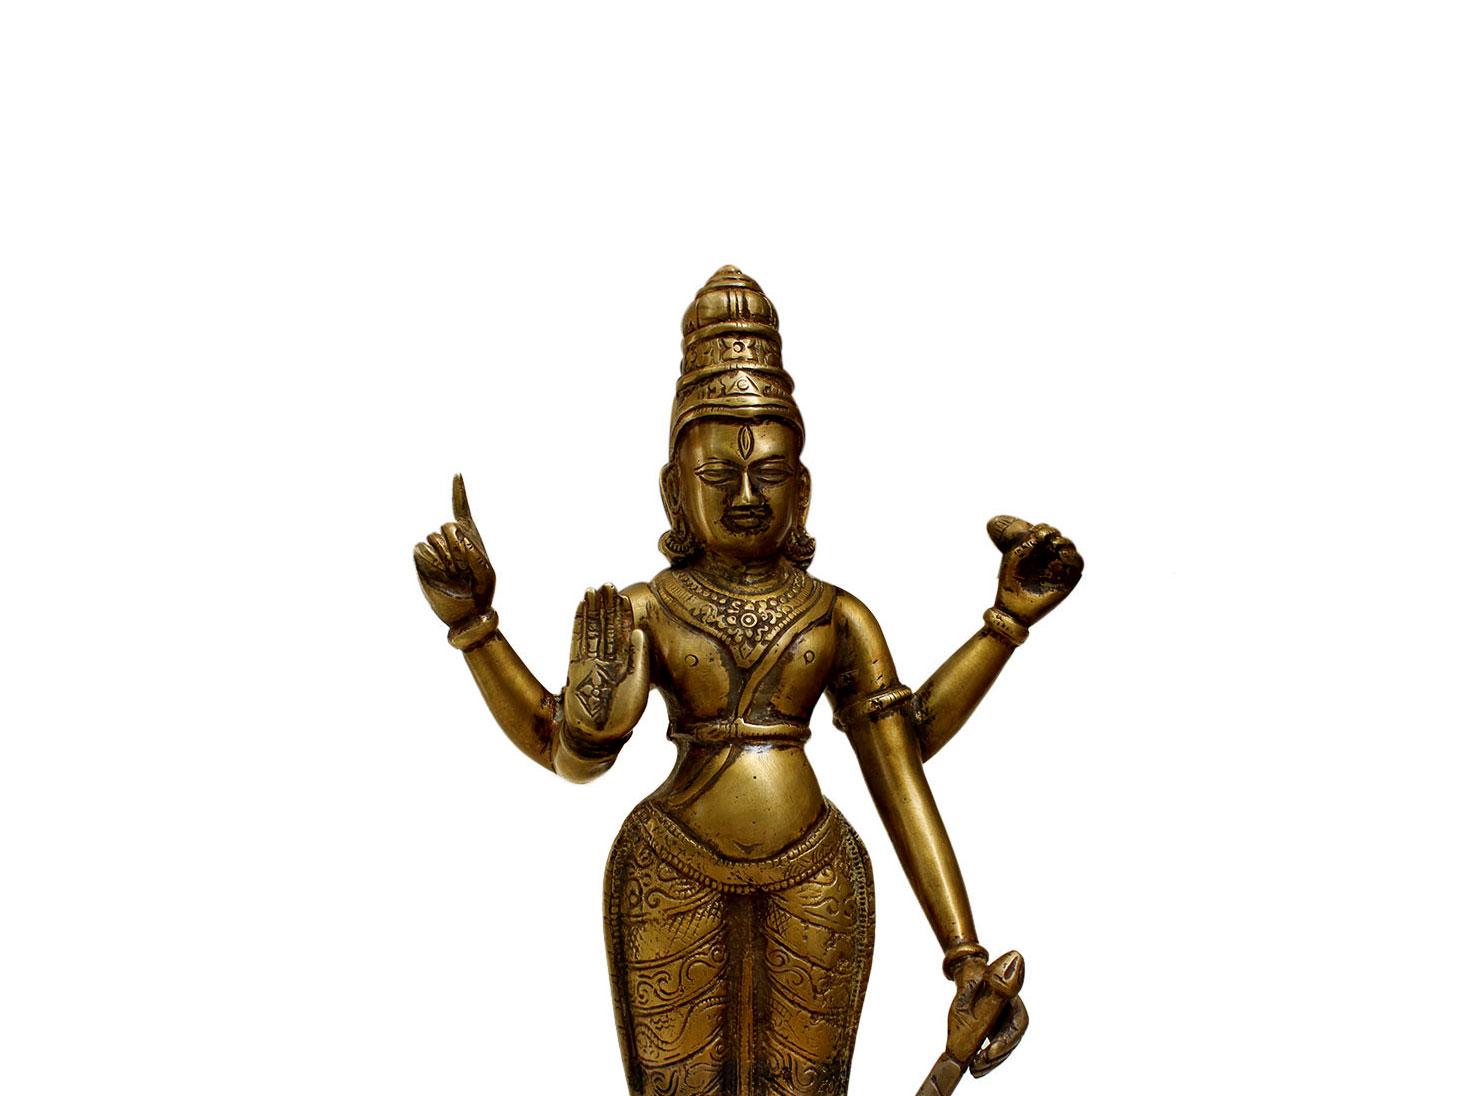 Brass Vishnuji (Ht-13.4 Inches)